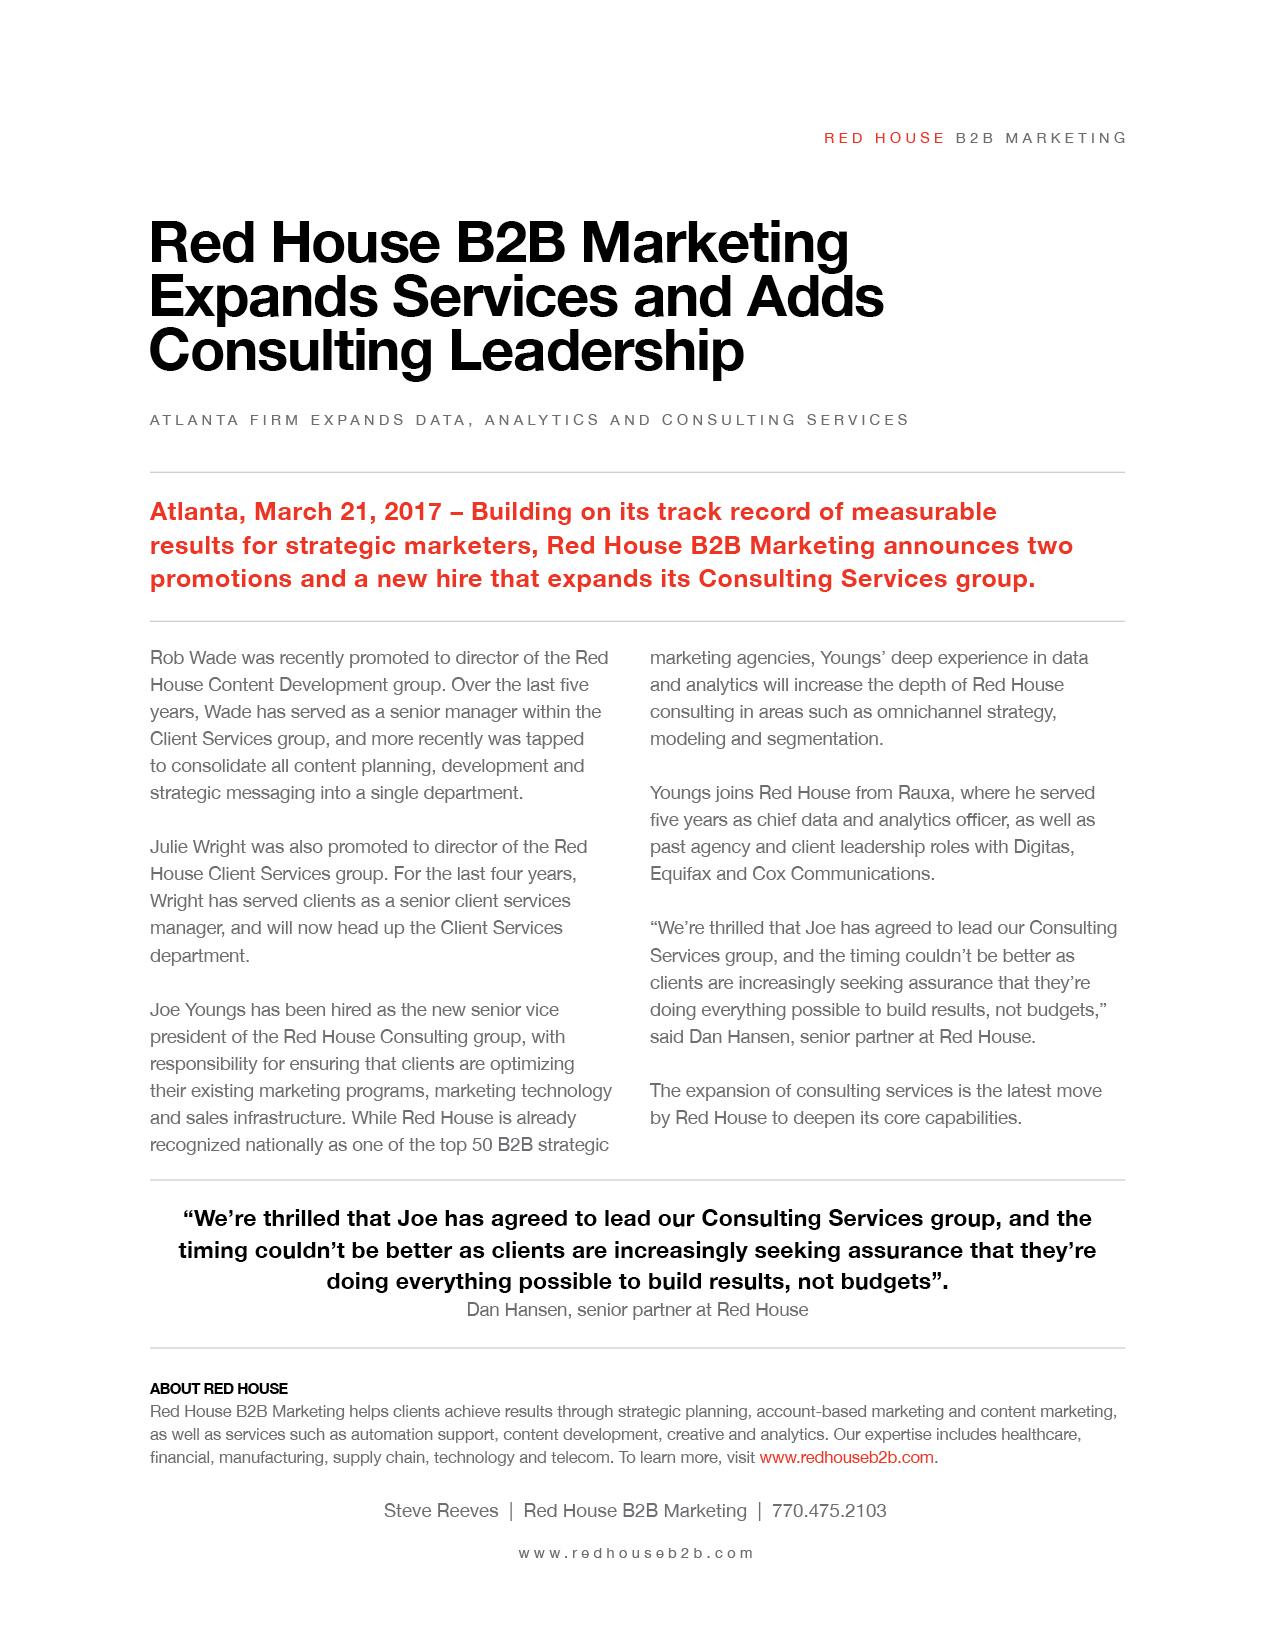 RHB2BMarketingExpandsServicesAddsConsultingLeadership_20170822